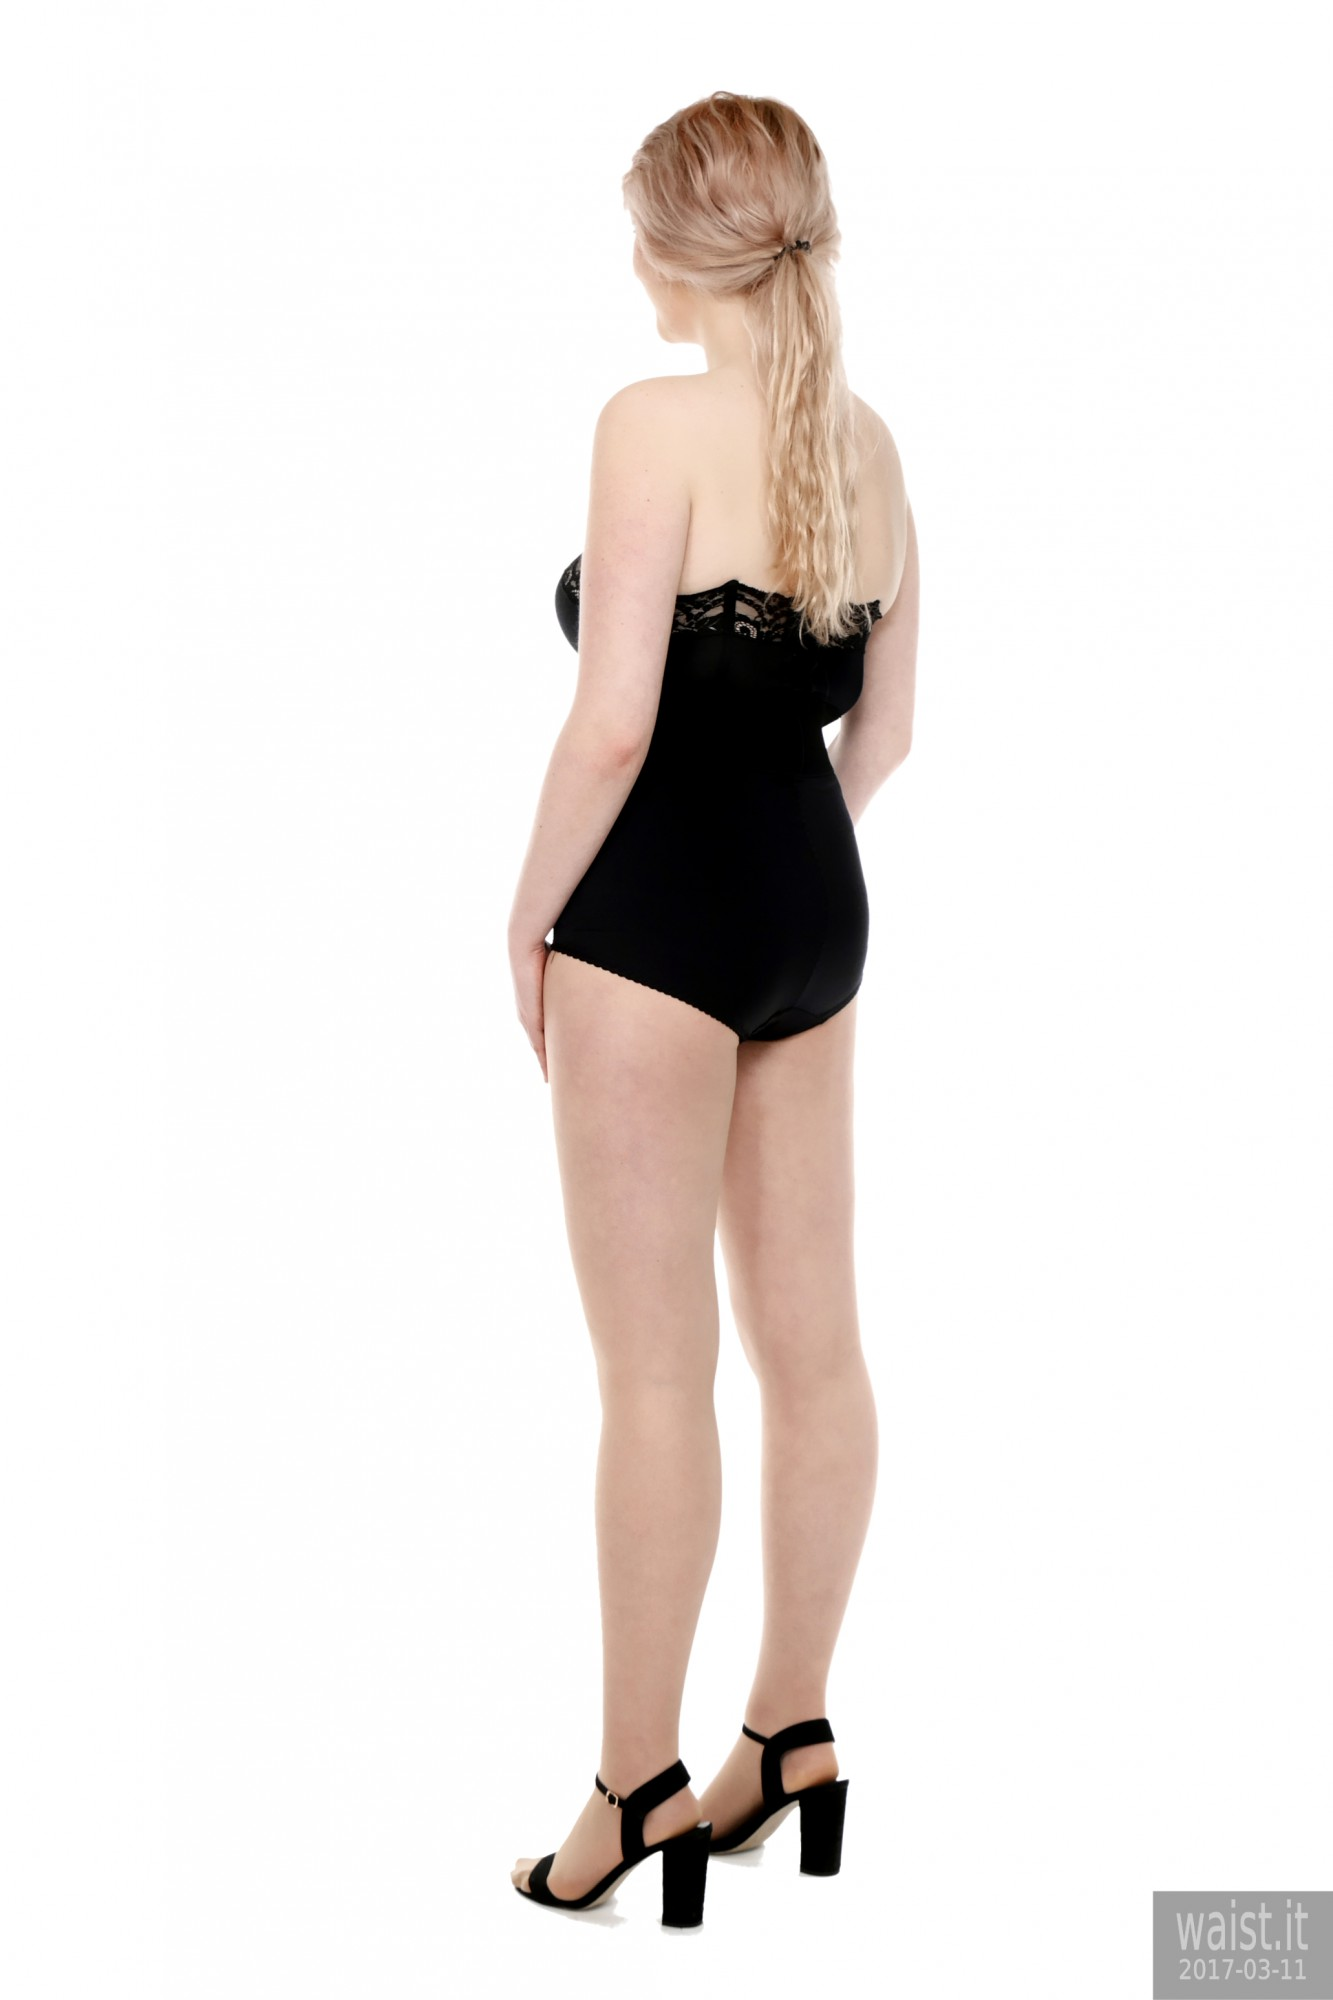 2017-03-11 LilyAmber black bra and style 210 pantie girdle plus black elastic belt